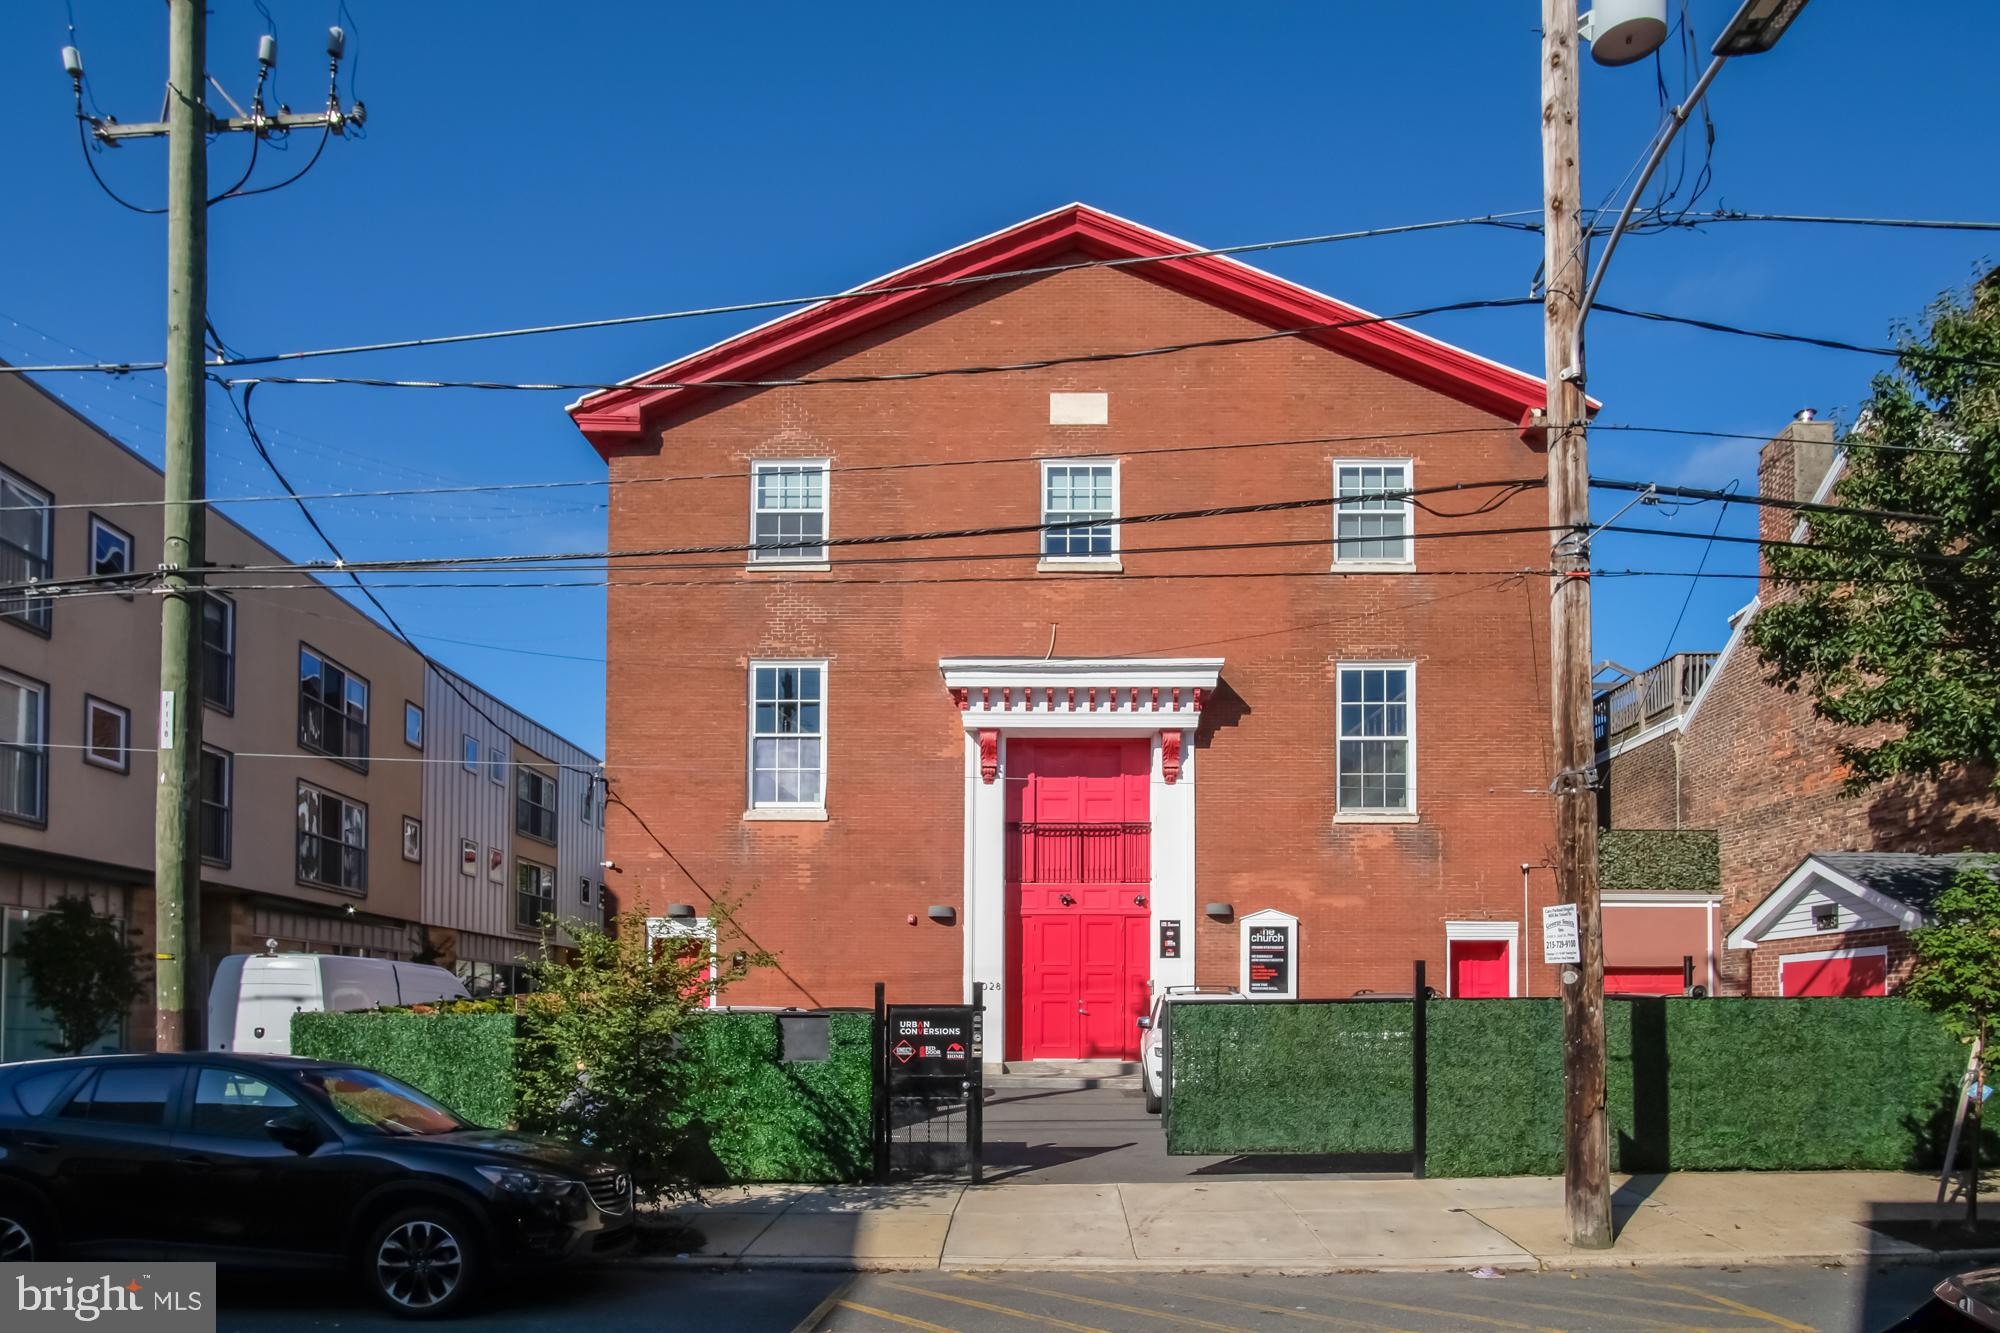 1028-34 N 3rd St, Philadelphia, PA, 19123